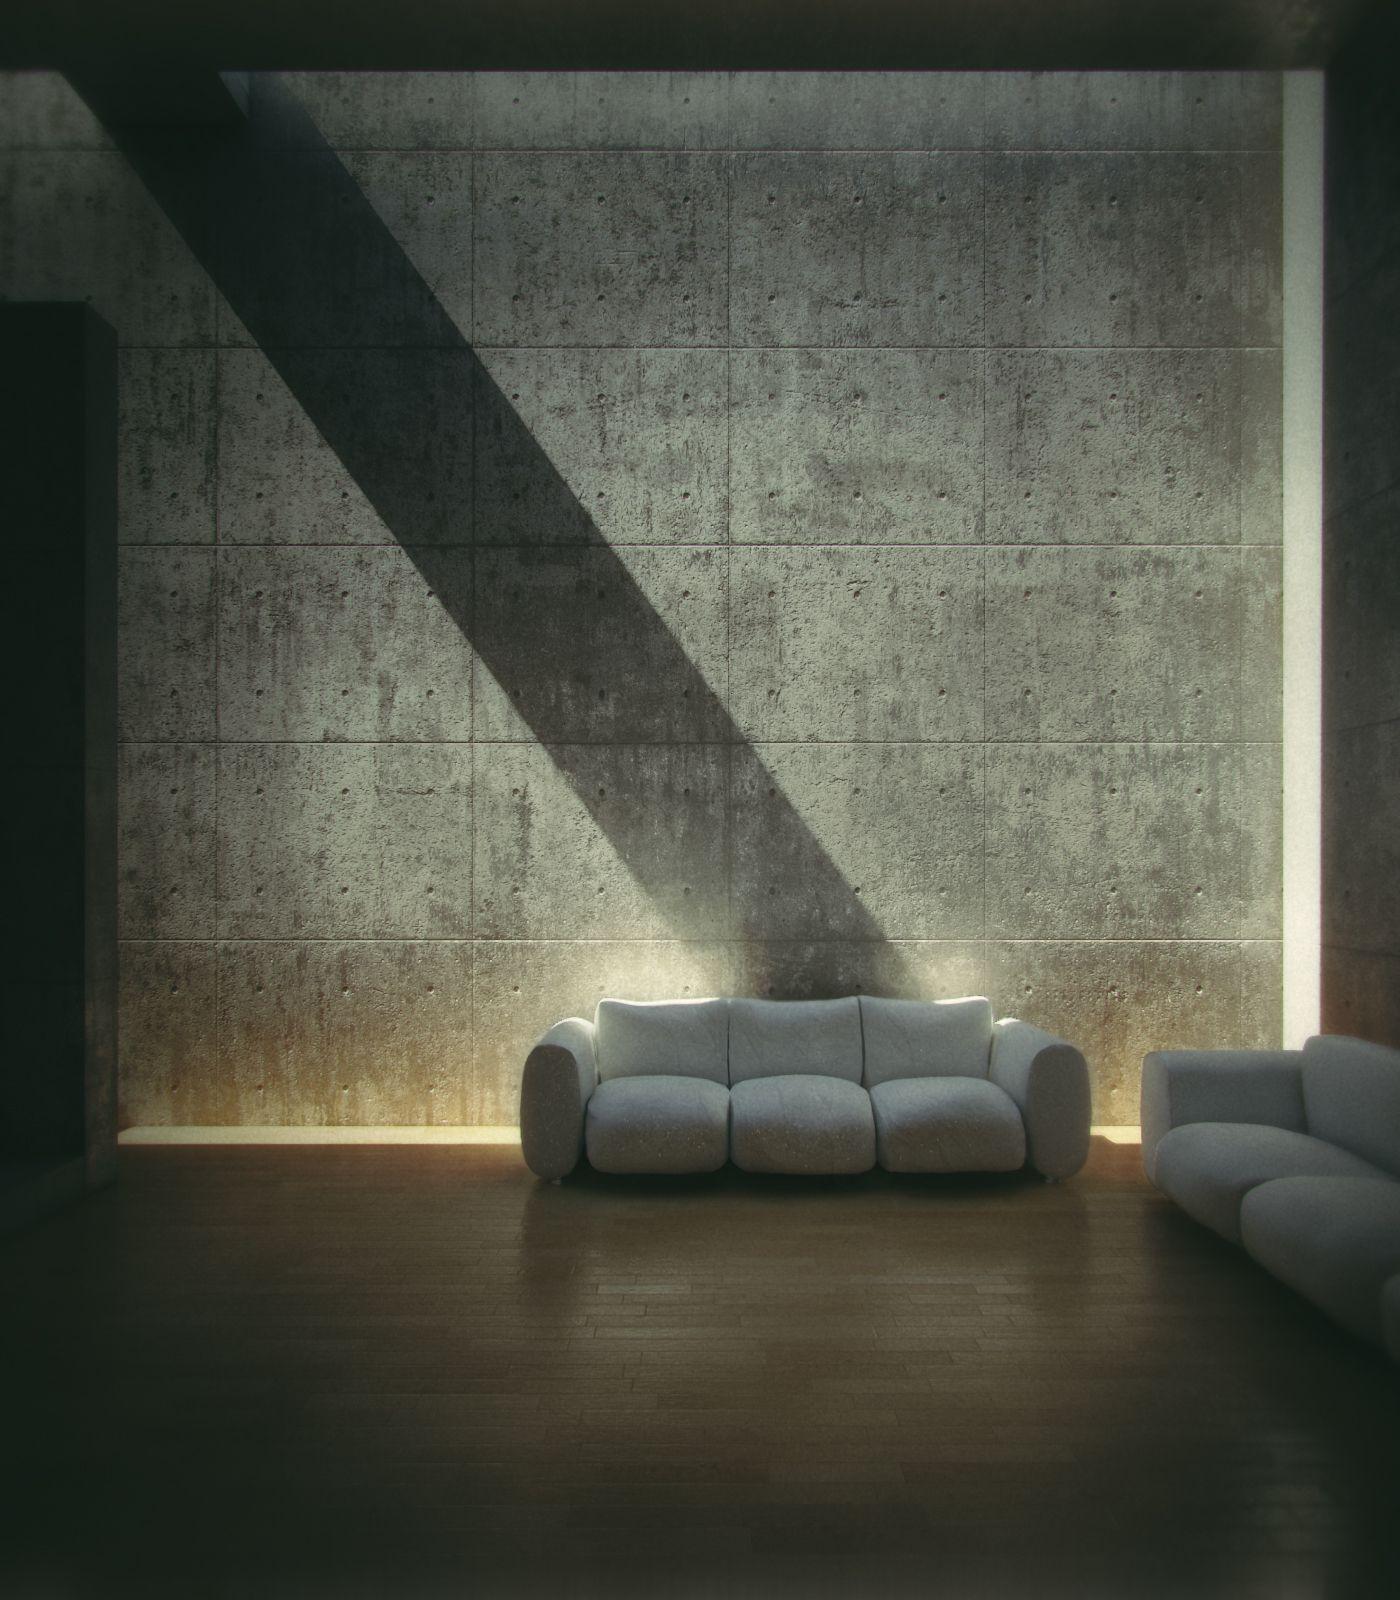 Koshino House by Tadao Ando. Interior redered by Gonzalo P. Martos